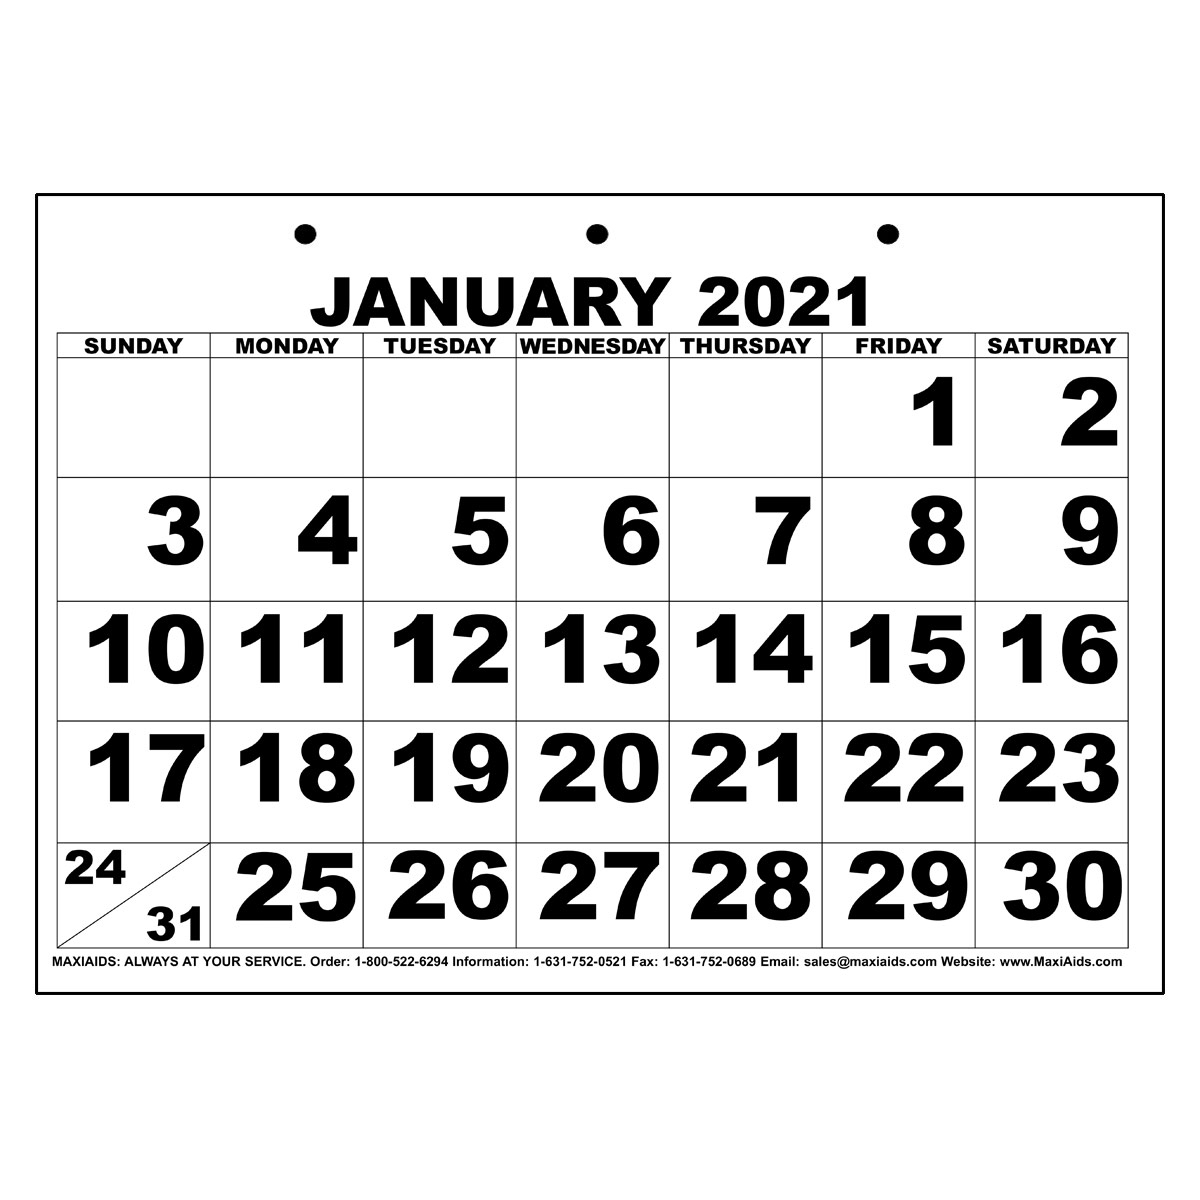 Low Vision Print Calendar - 2021 pertaining to 2021 Large Bold Printable Calendar